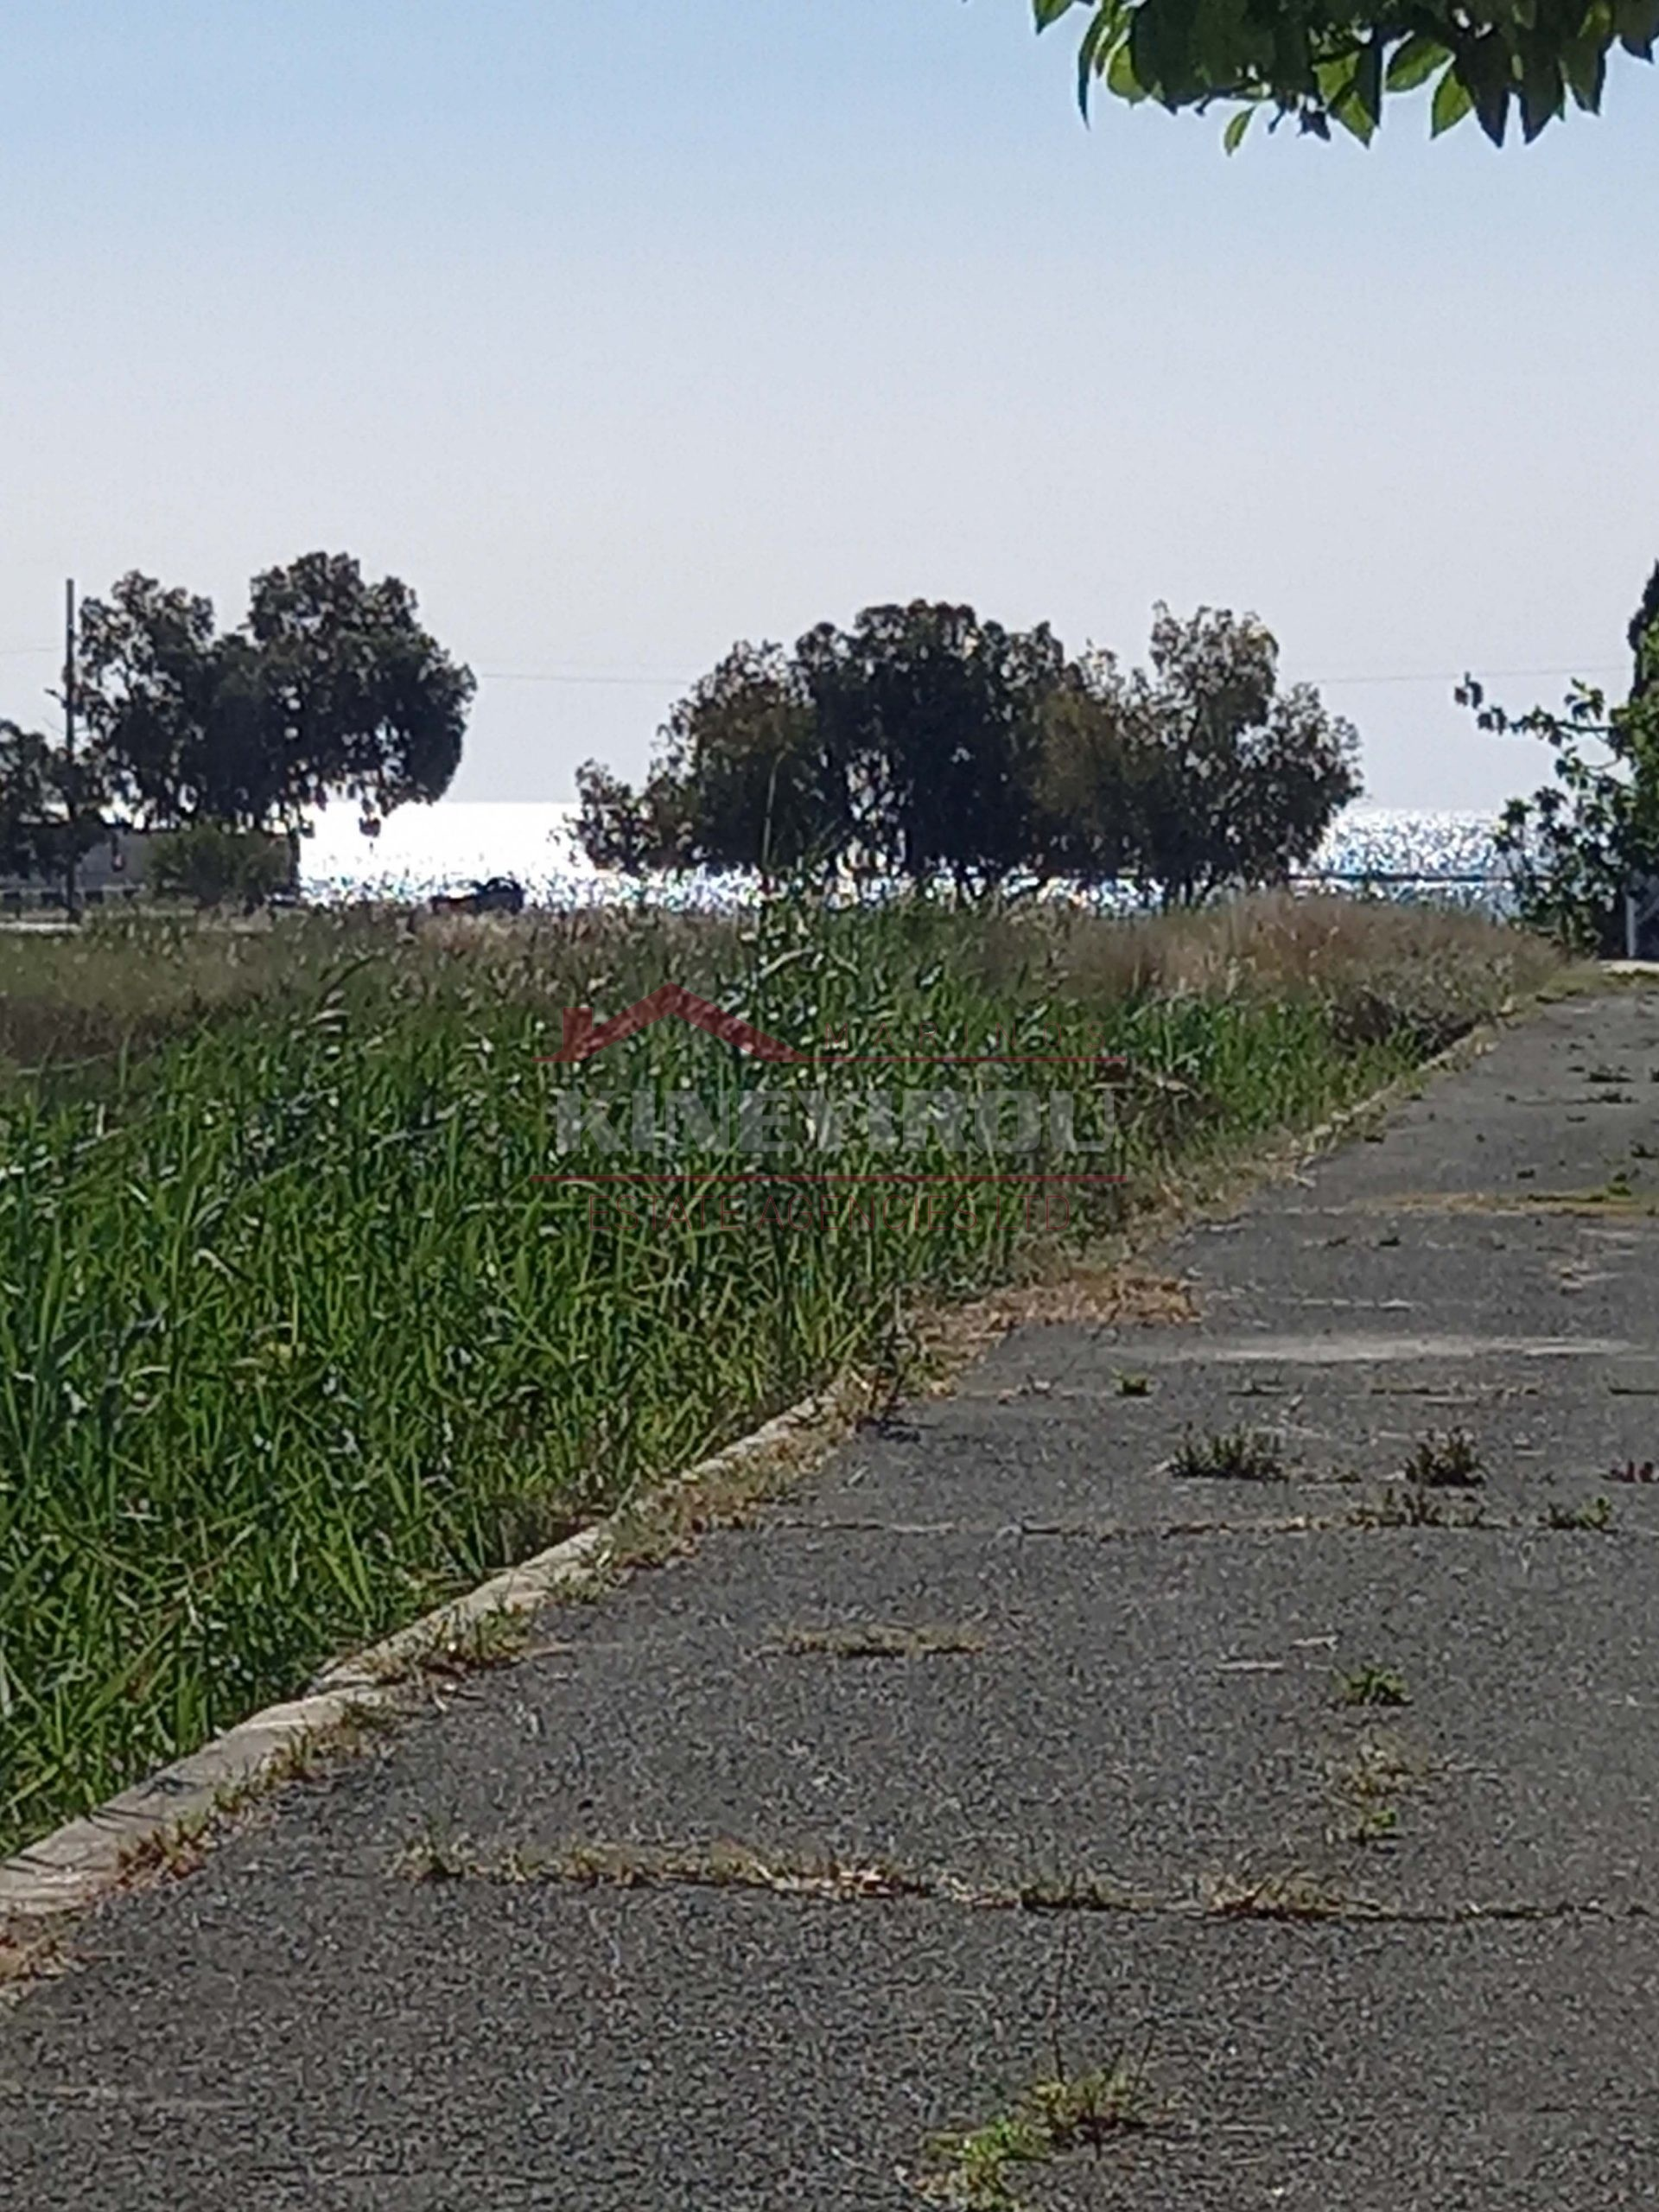 Investment property in Dekelia road, Larnaca